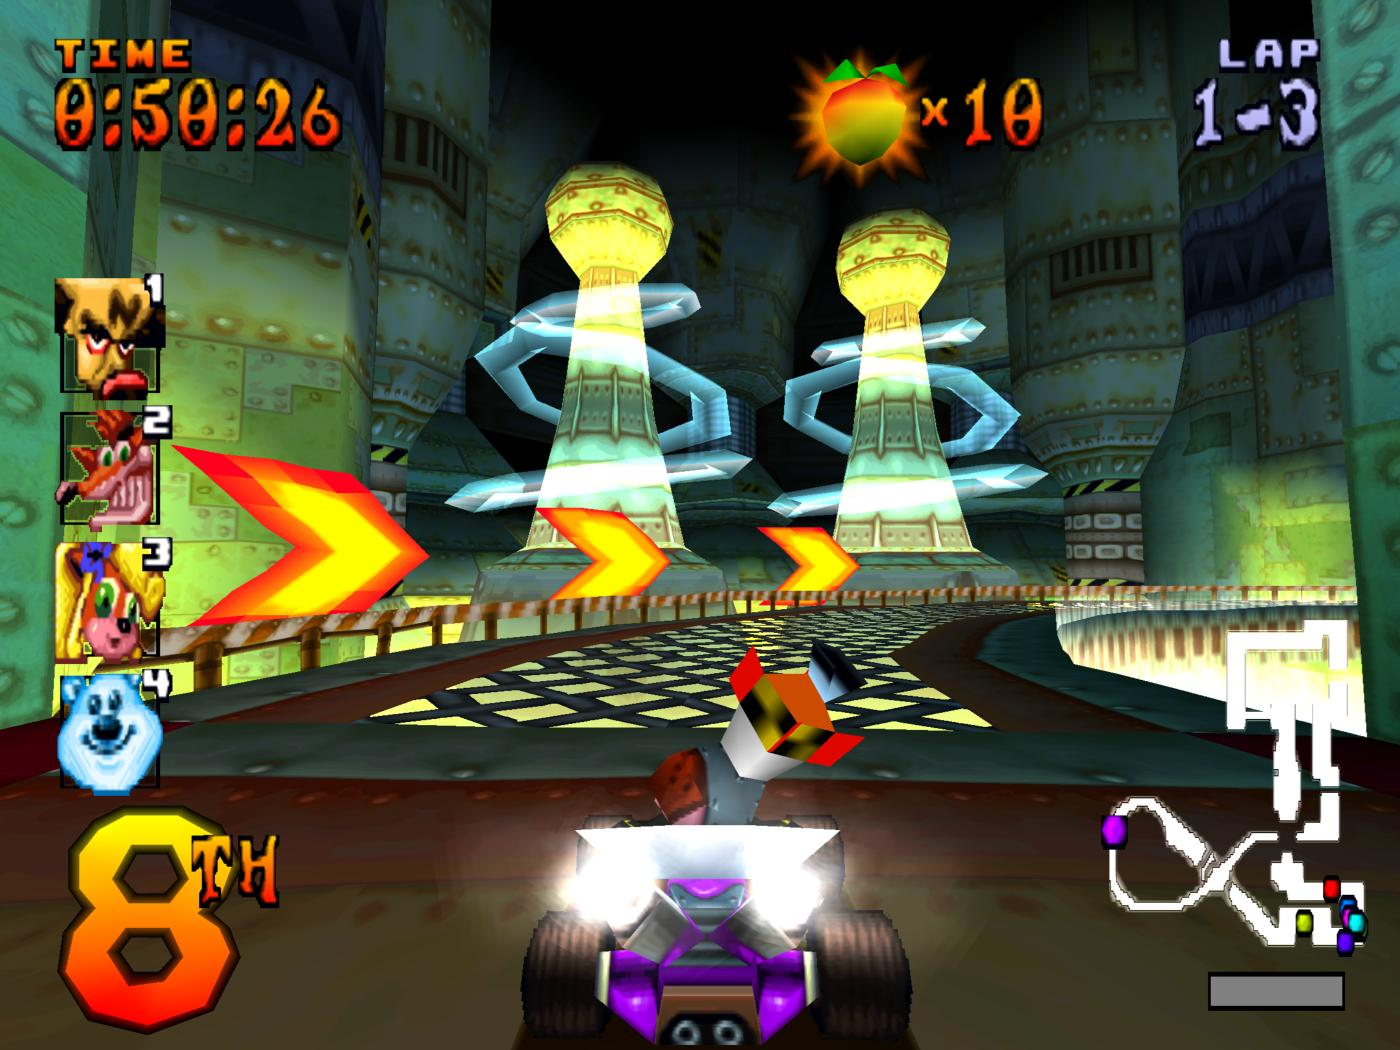 Crash Team Racing (CTR) Punya Versi Remastered?